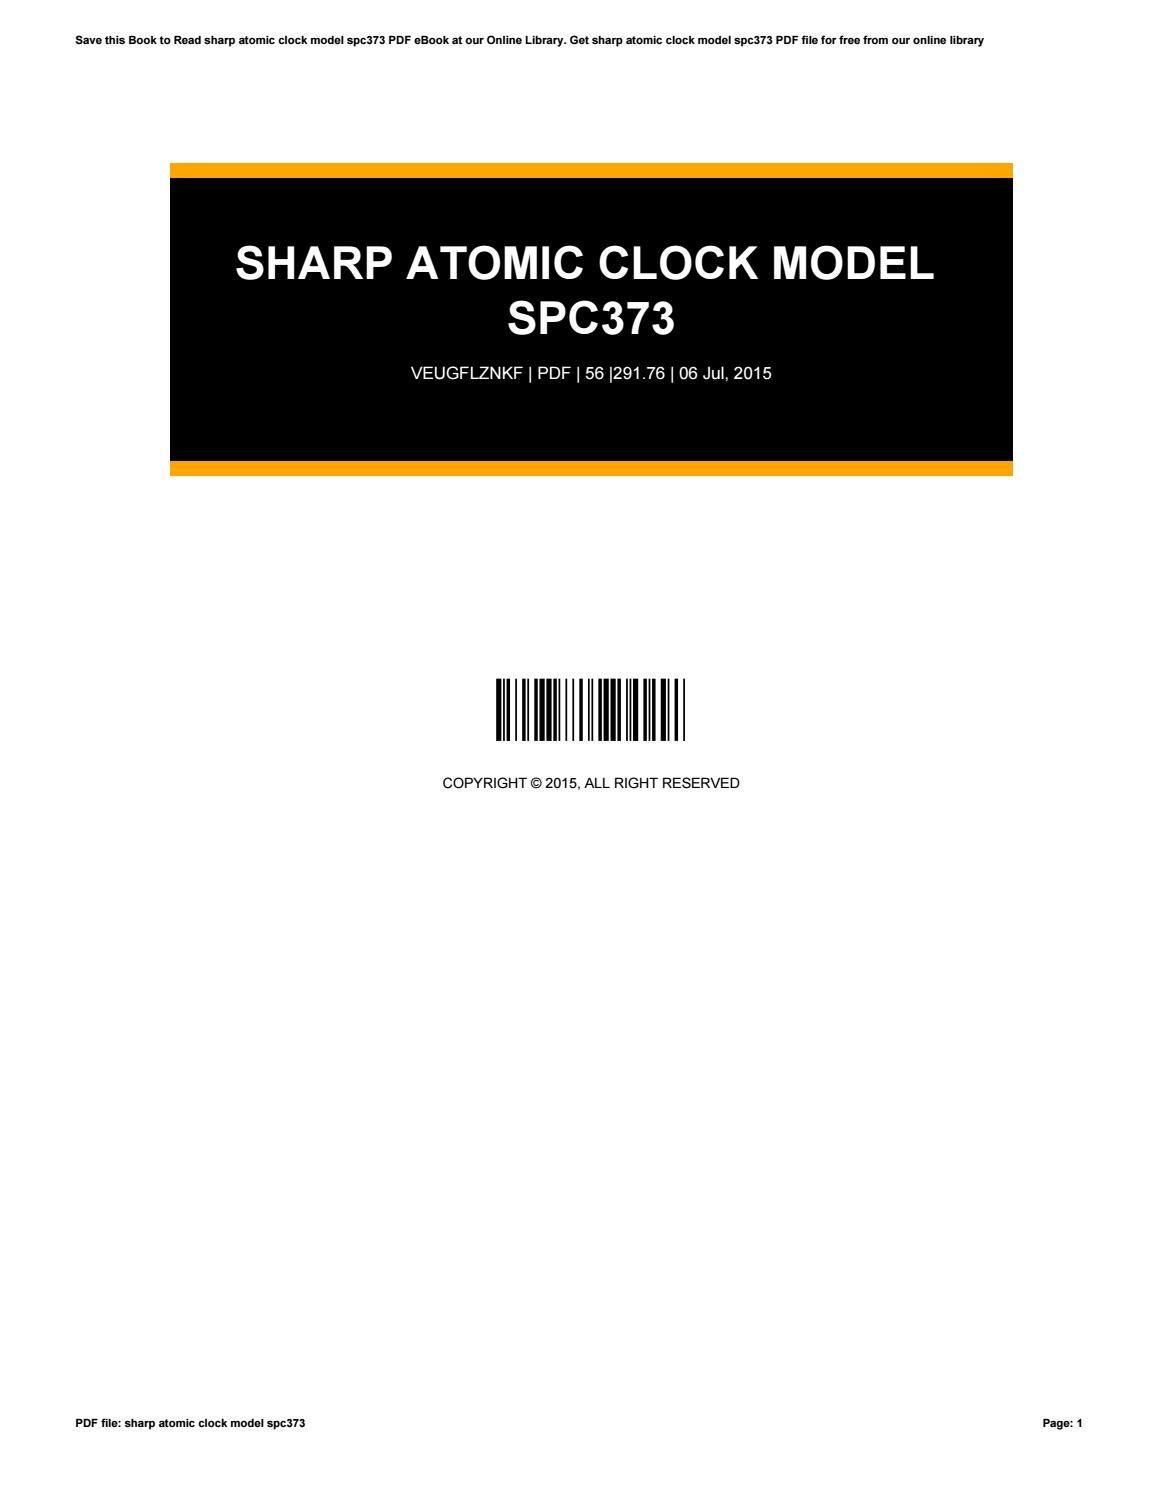 sharp atomic clock manual spc373